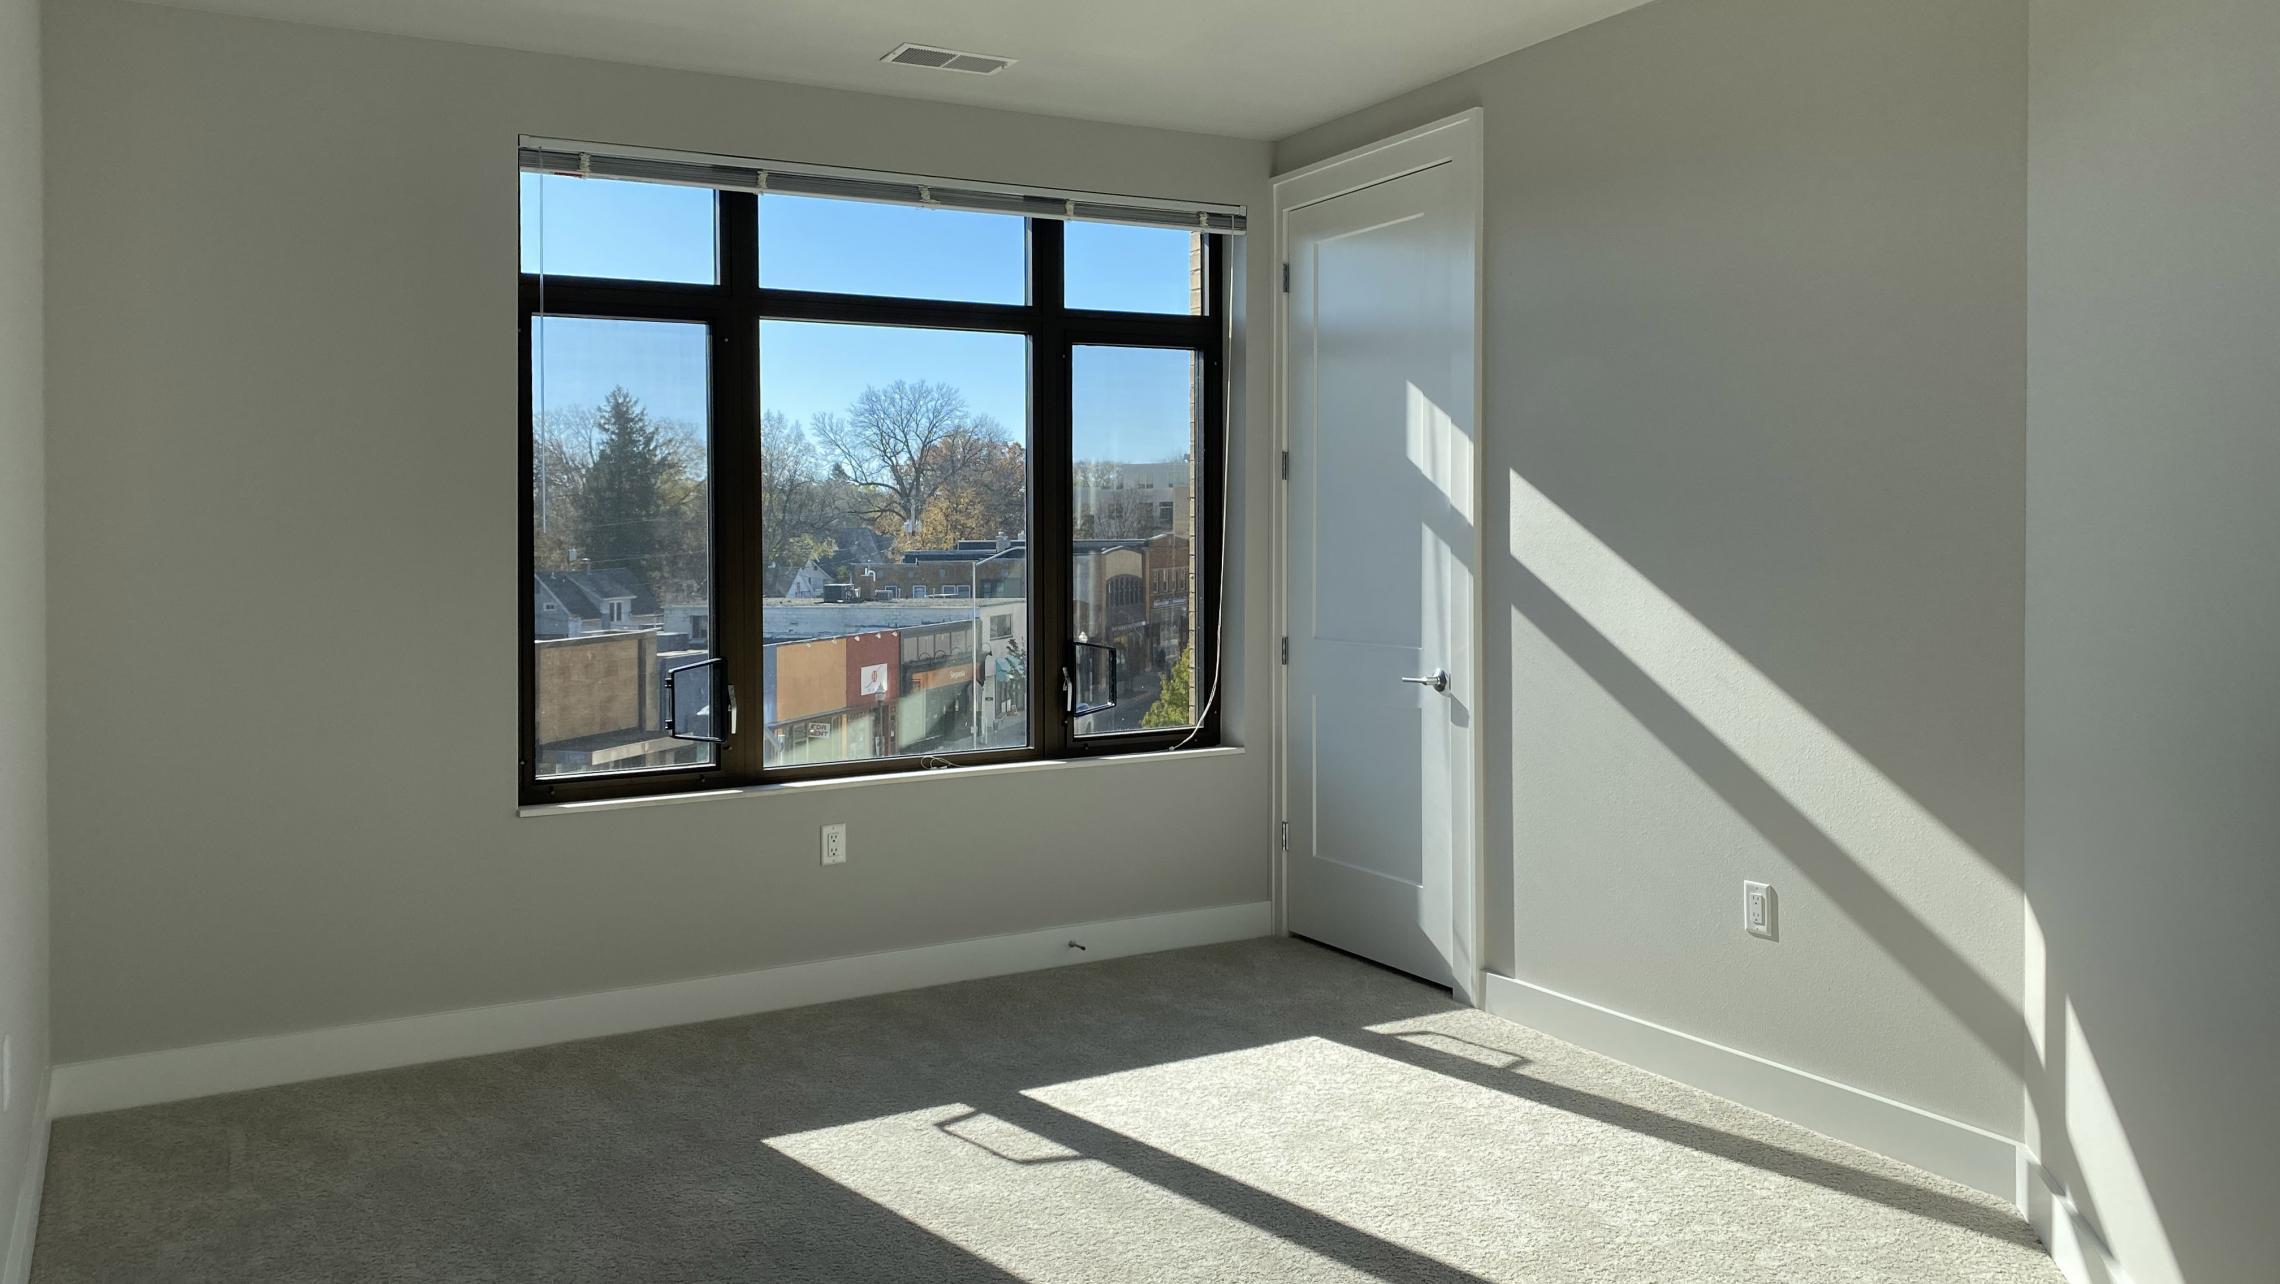 1722-Monroe-Apartments-419-Three-Bedroom-Modern-Upscale-Design-Windows-Natural-Light-Gym-Terrace-Living-Luxury-Lounge-Madison-Bedroom